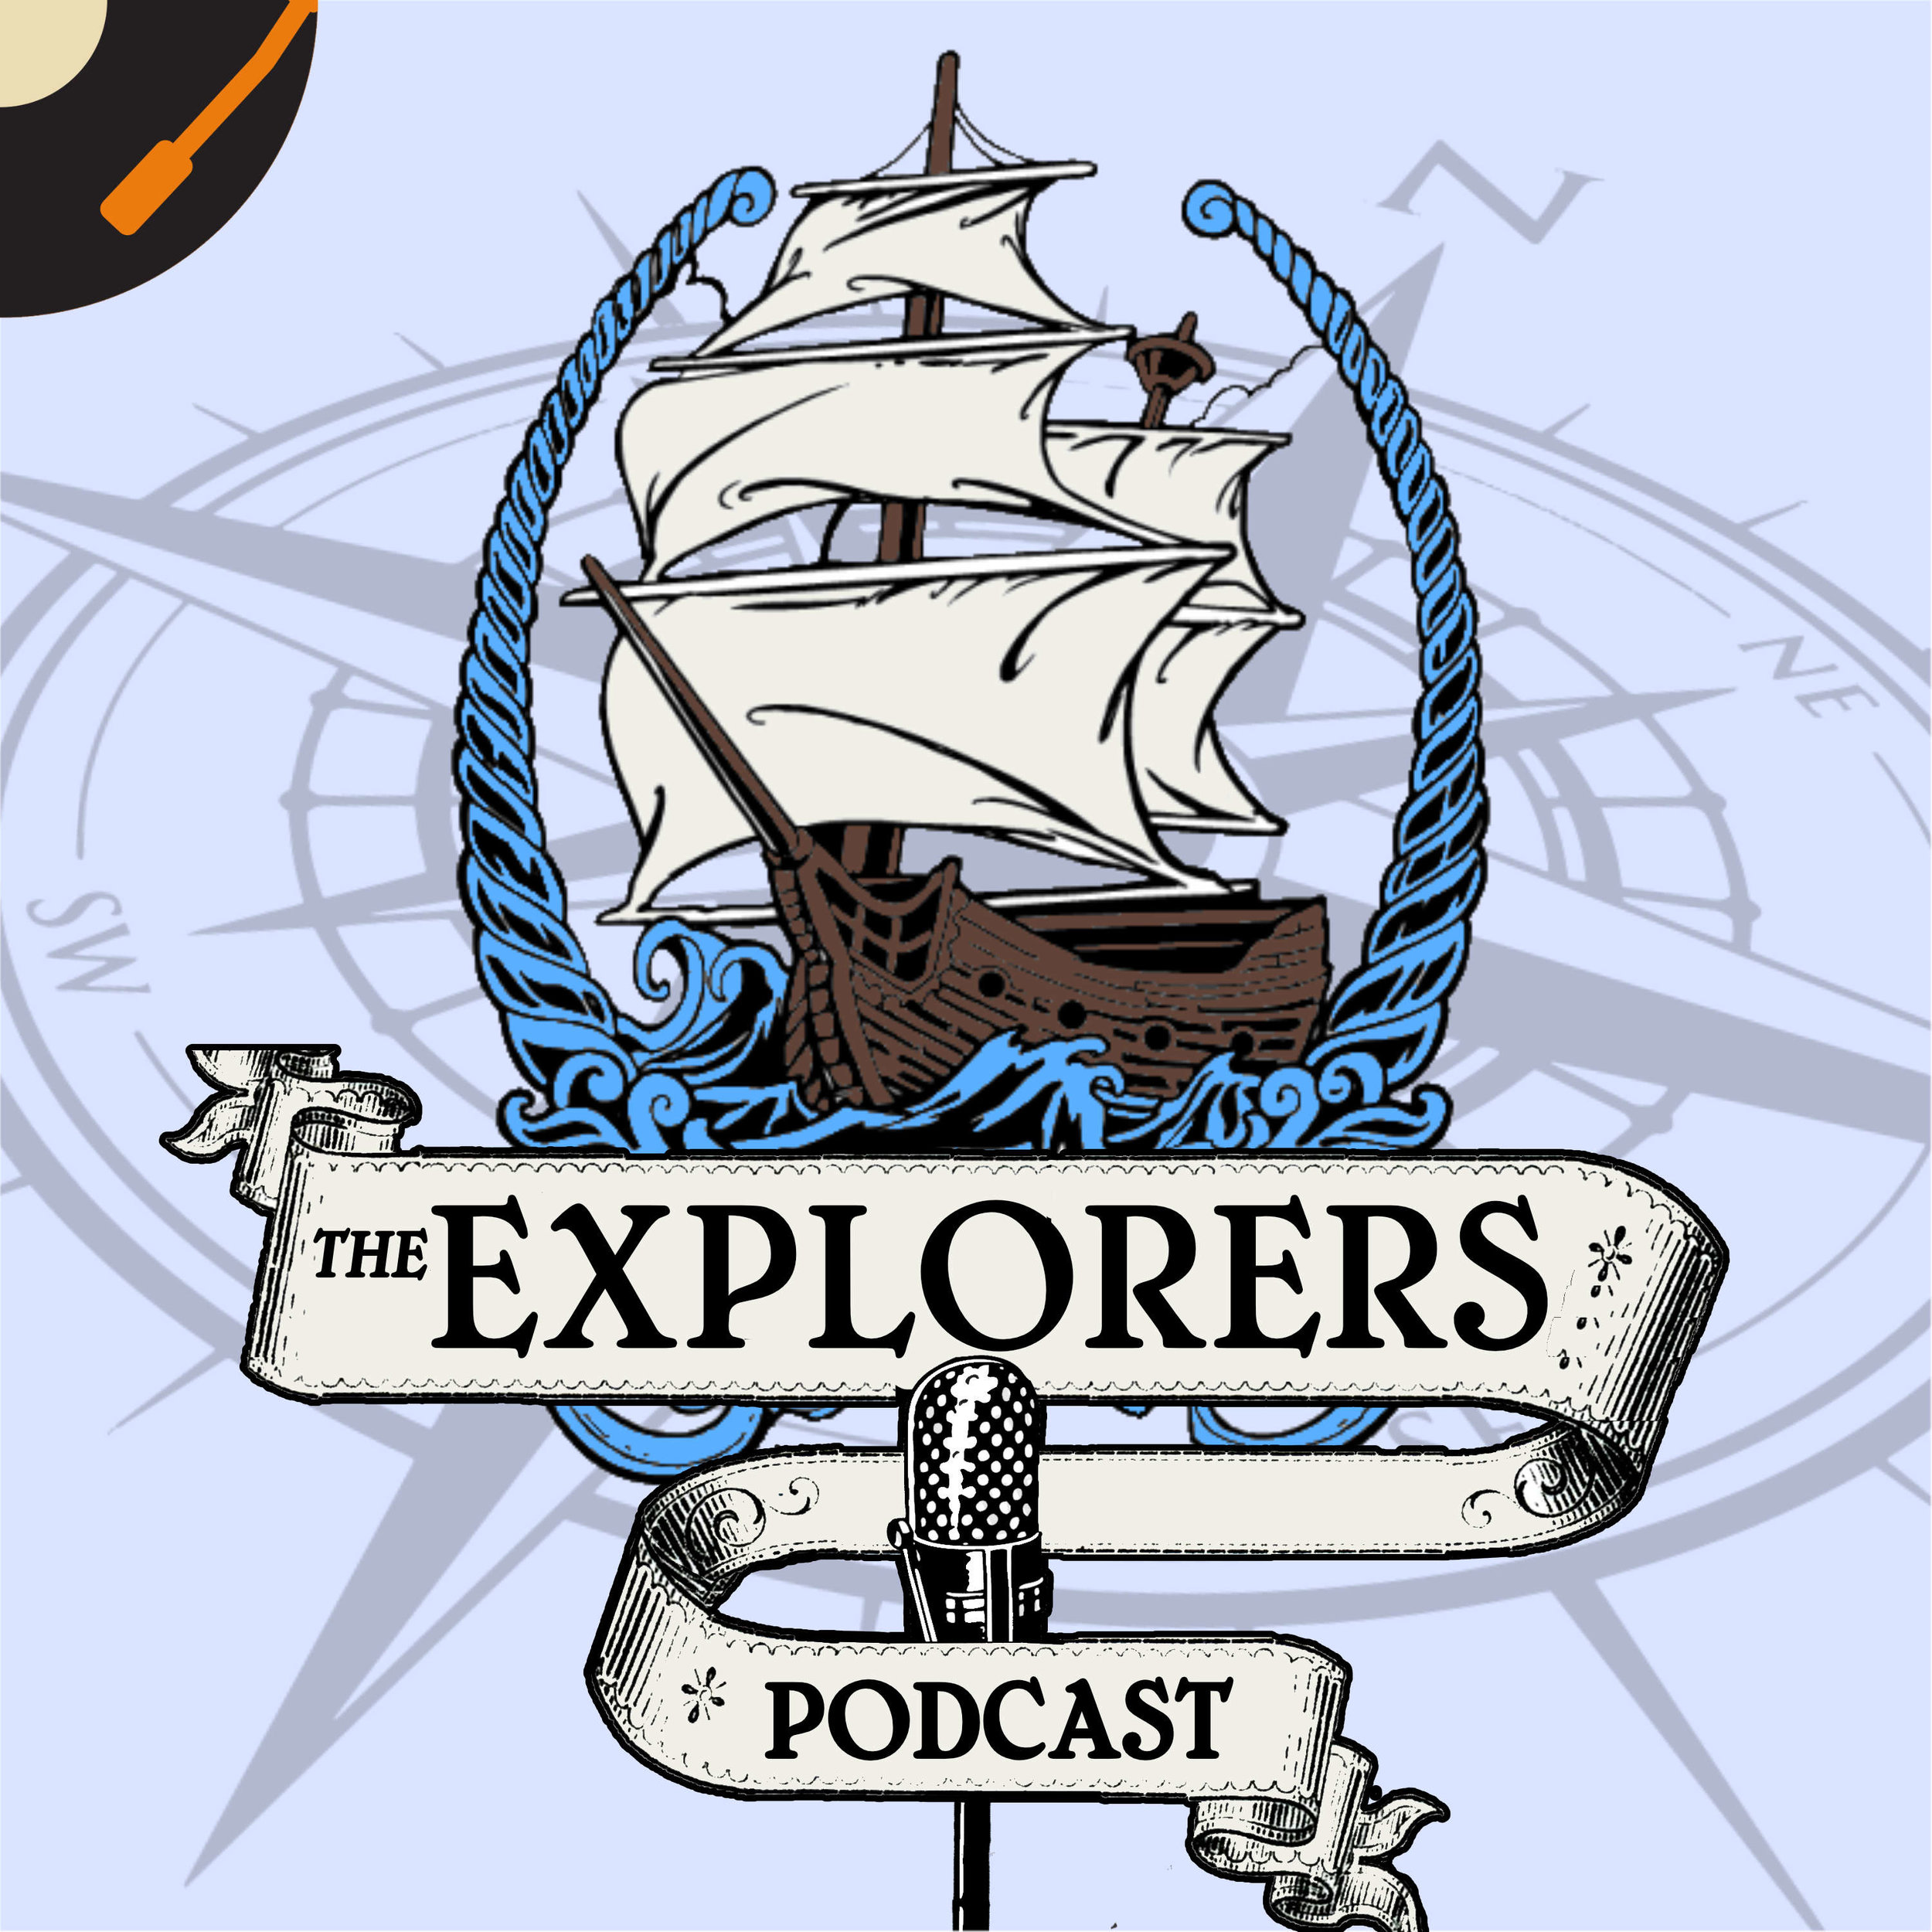 The_Explorers_Podcast.jpg